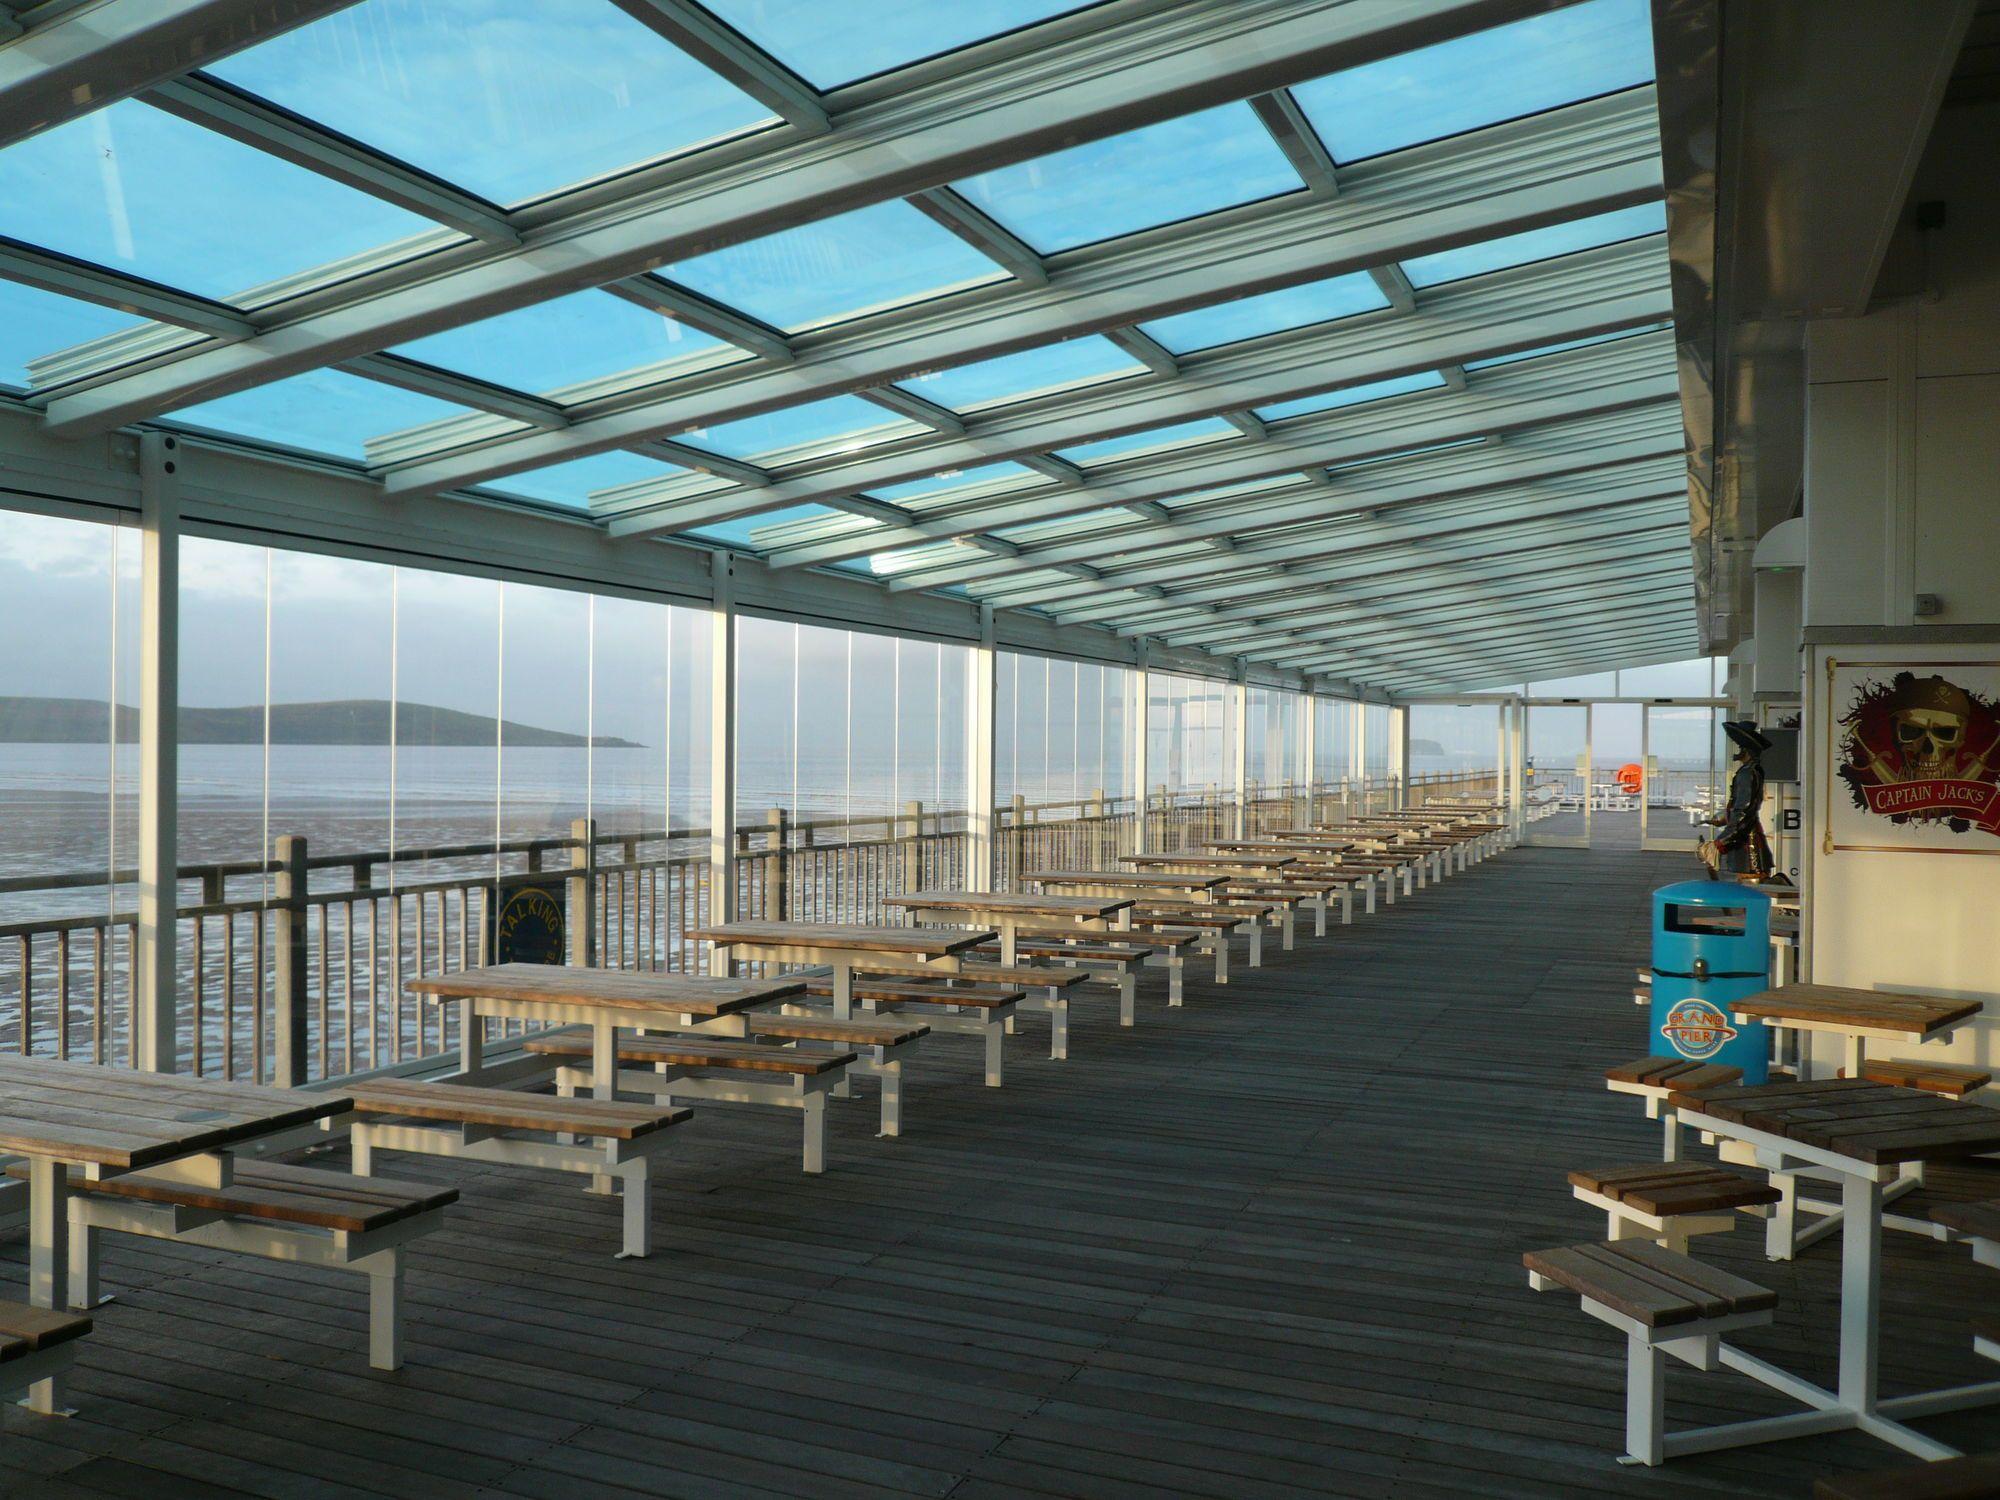 Aluminum Roofing Waterproof Sliding T5000 5 4 4c Airclos Aluminium Systems Aluminum Roof Retractable Roof Modern Pergola